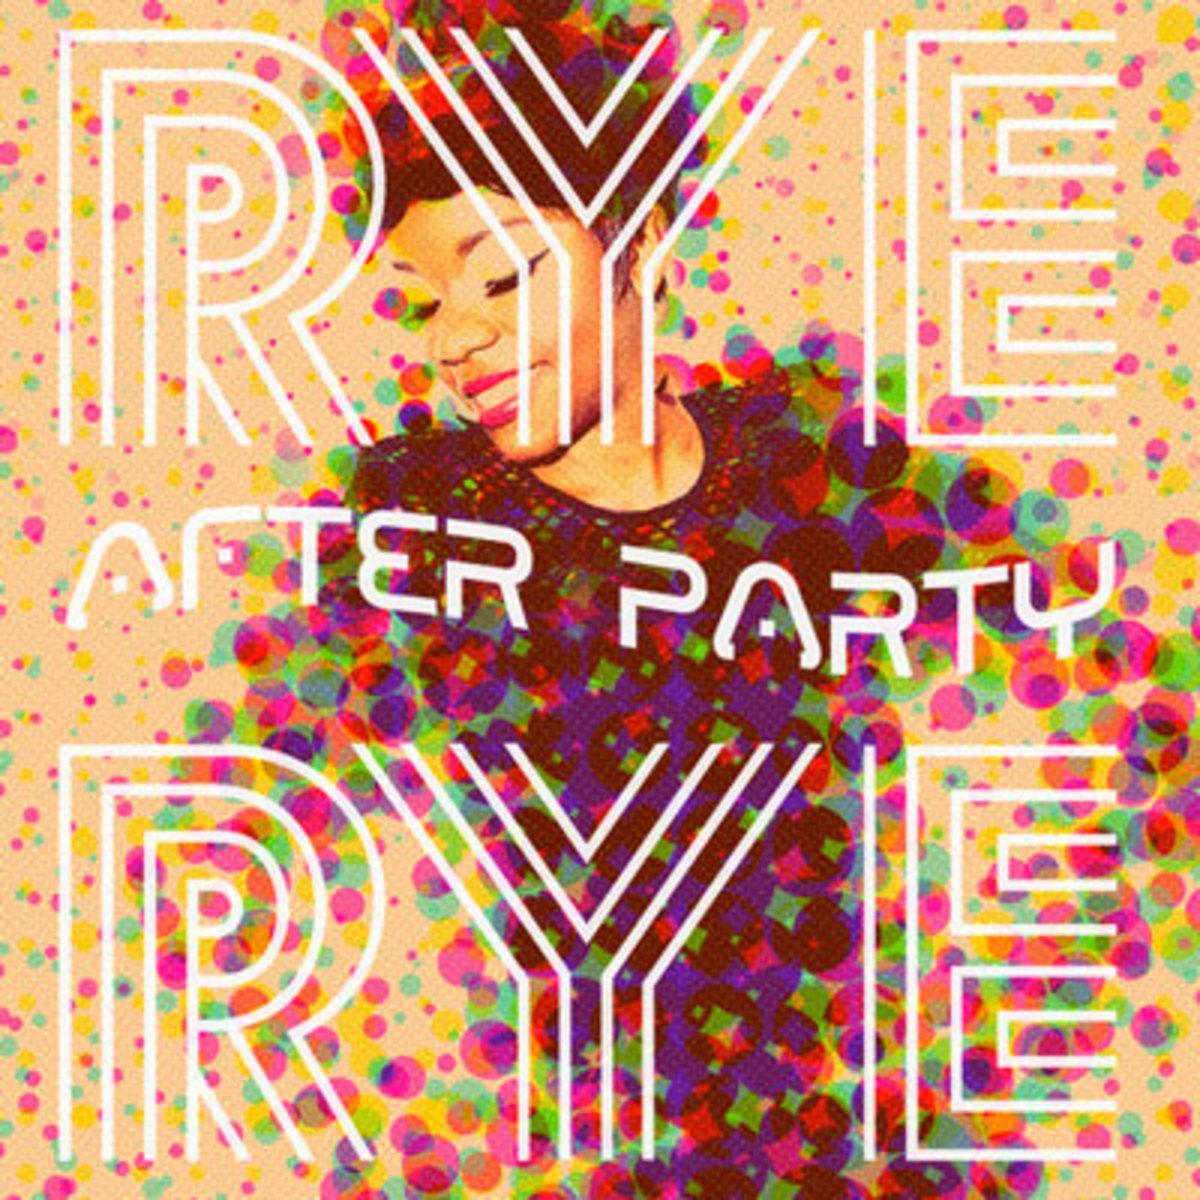 ryerye-afterparty.jpg